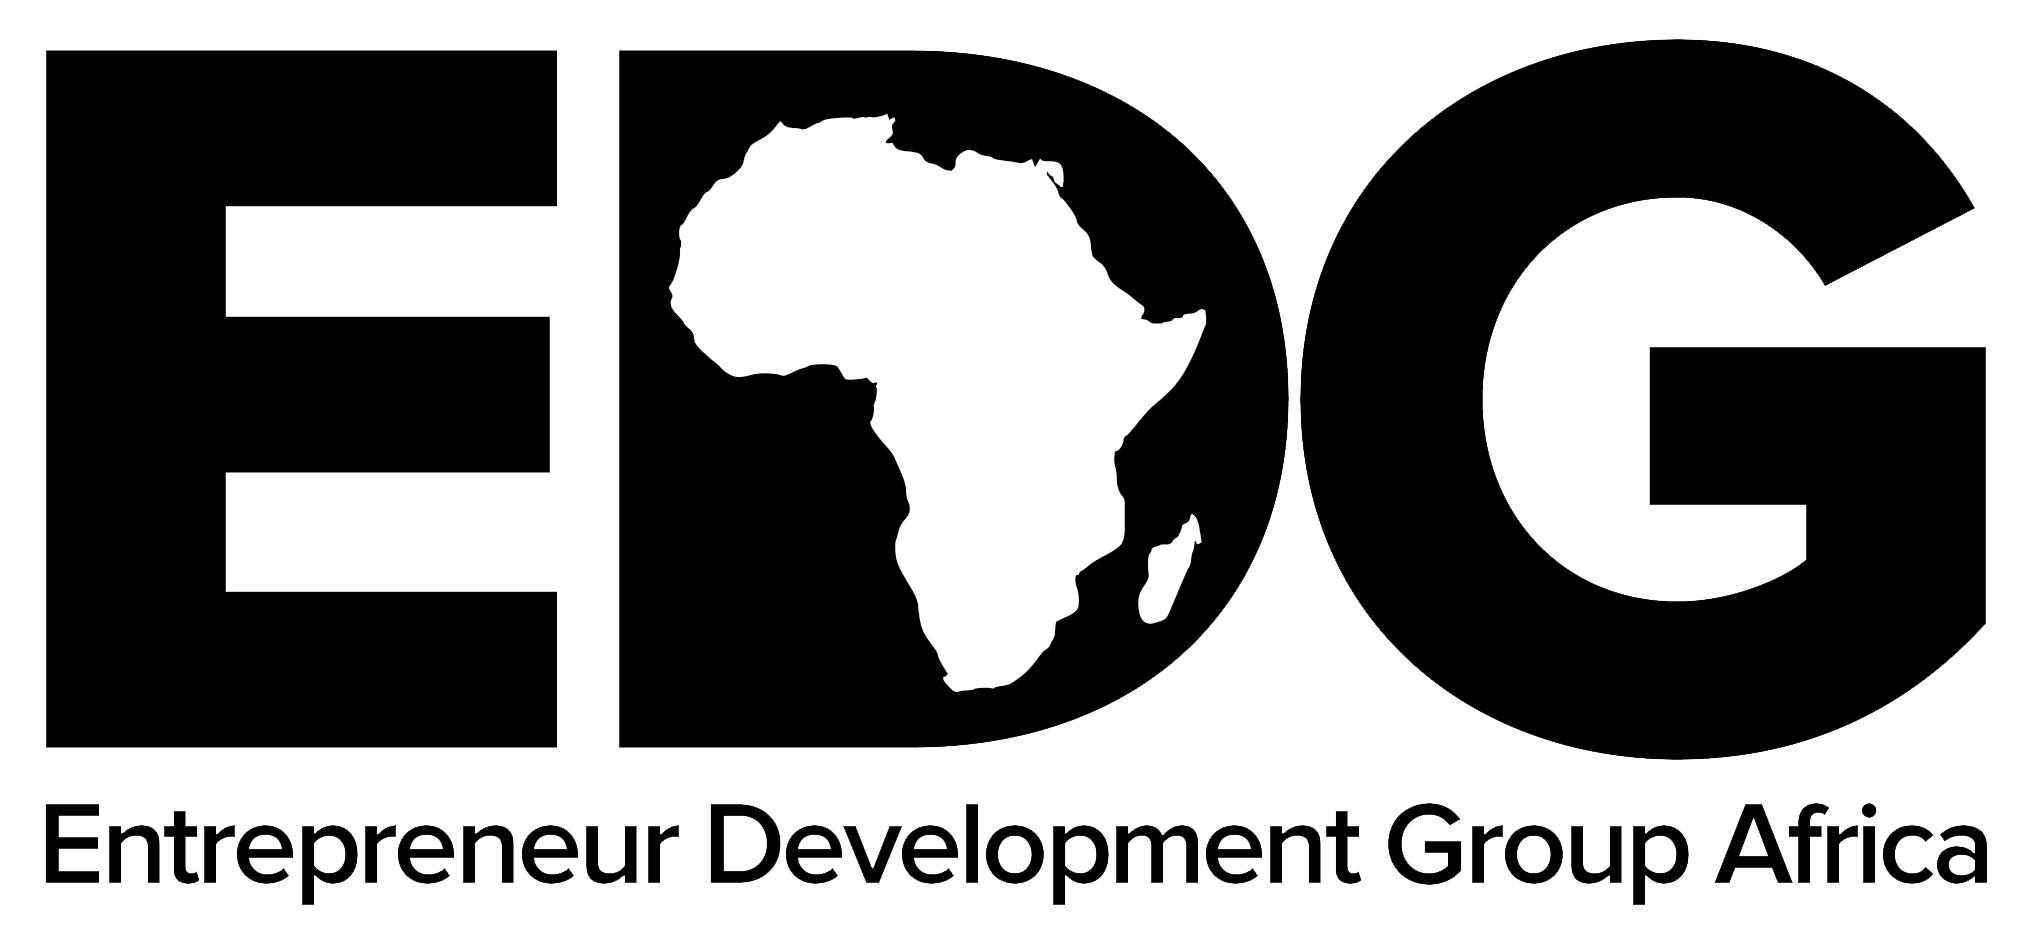 EDG Africa Transparent.png